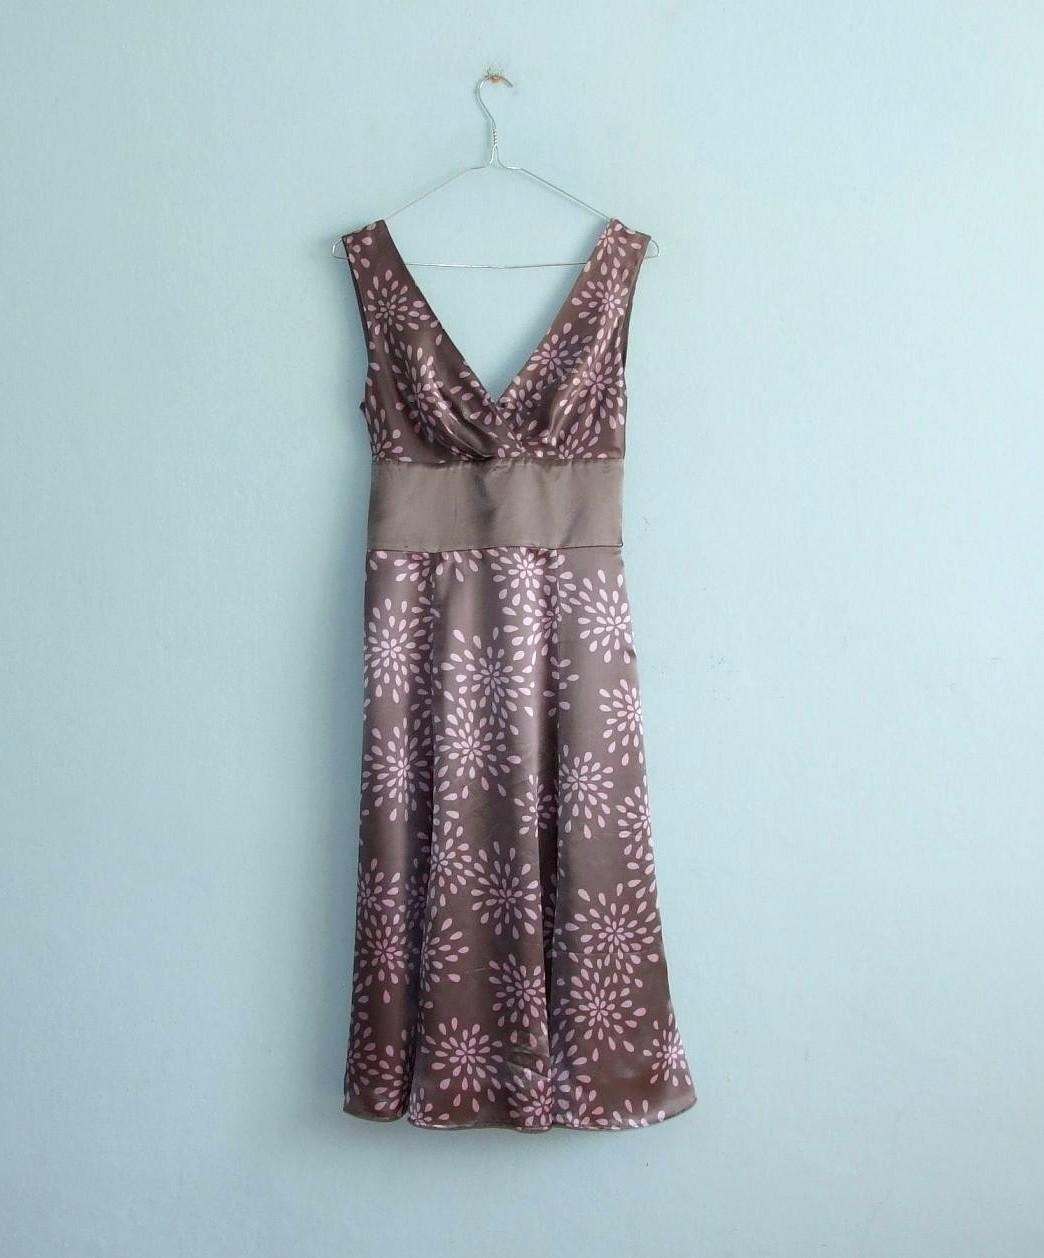 Ted Baker Nežne romantické hodvábne šaty PC140eur - Obrázok č. 1